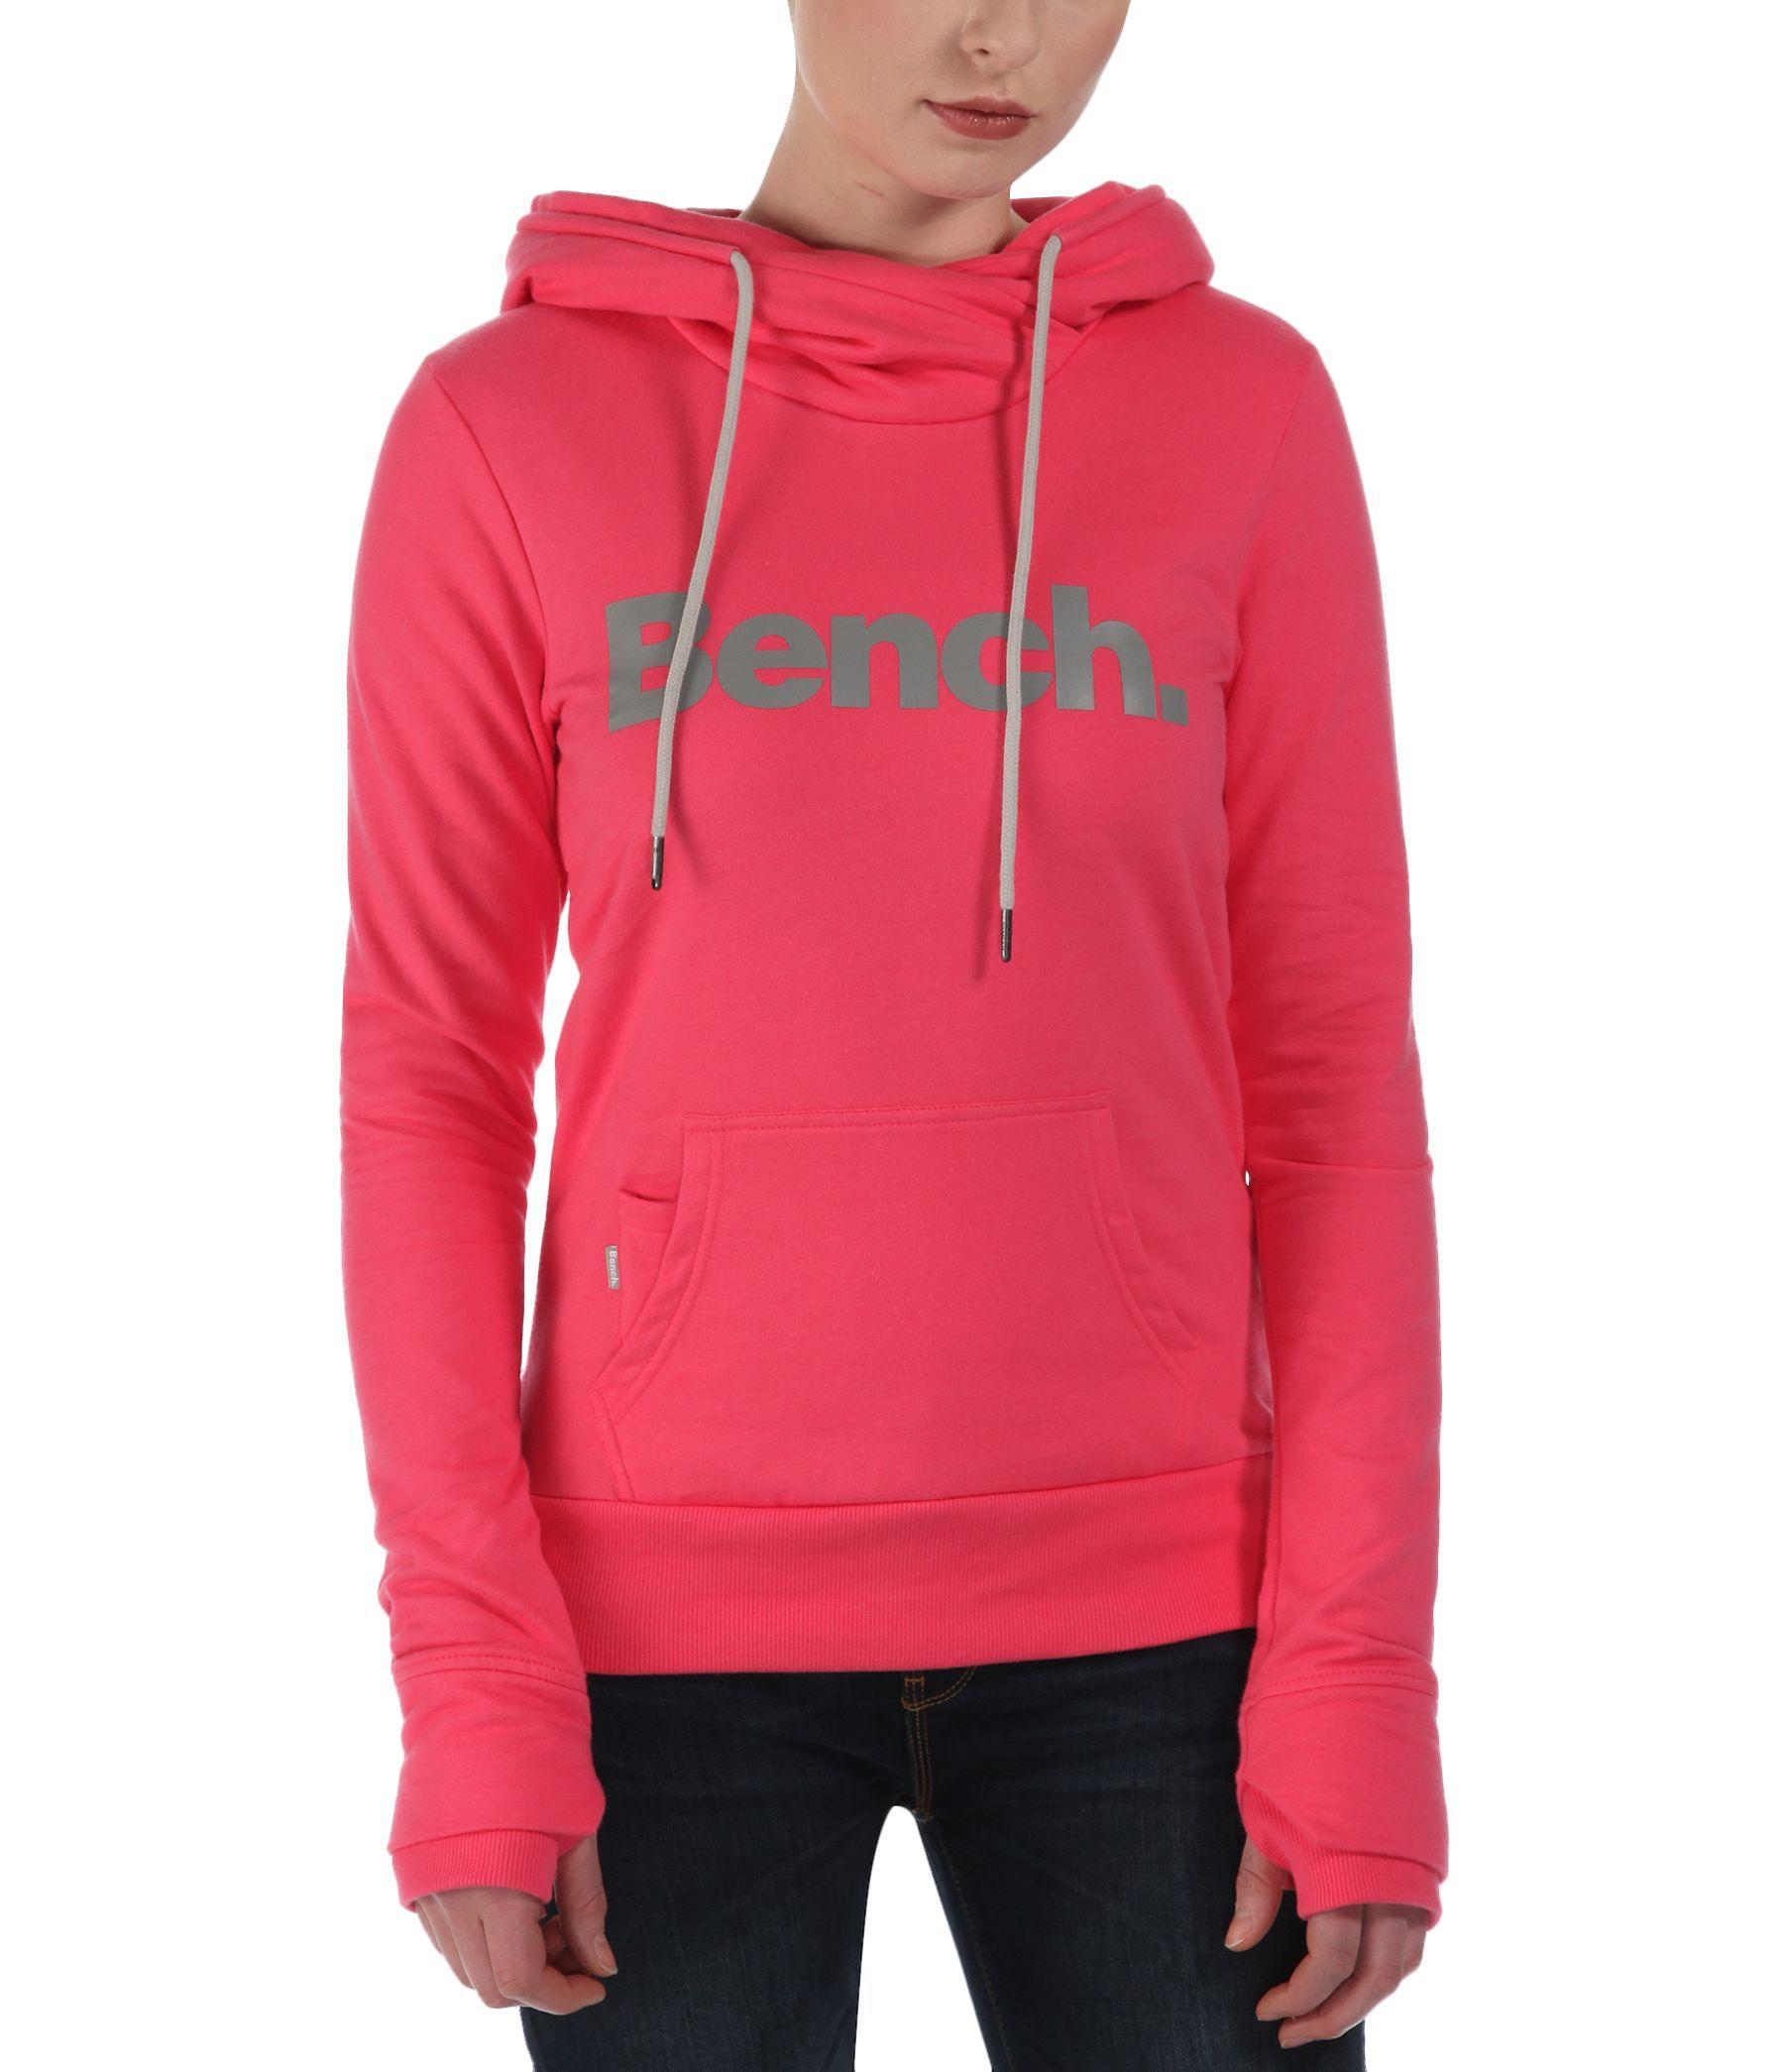 Bench Yoport Corp Logo Sweatshirt Hoodie In Pink Lyst